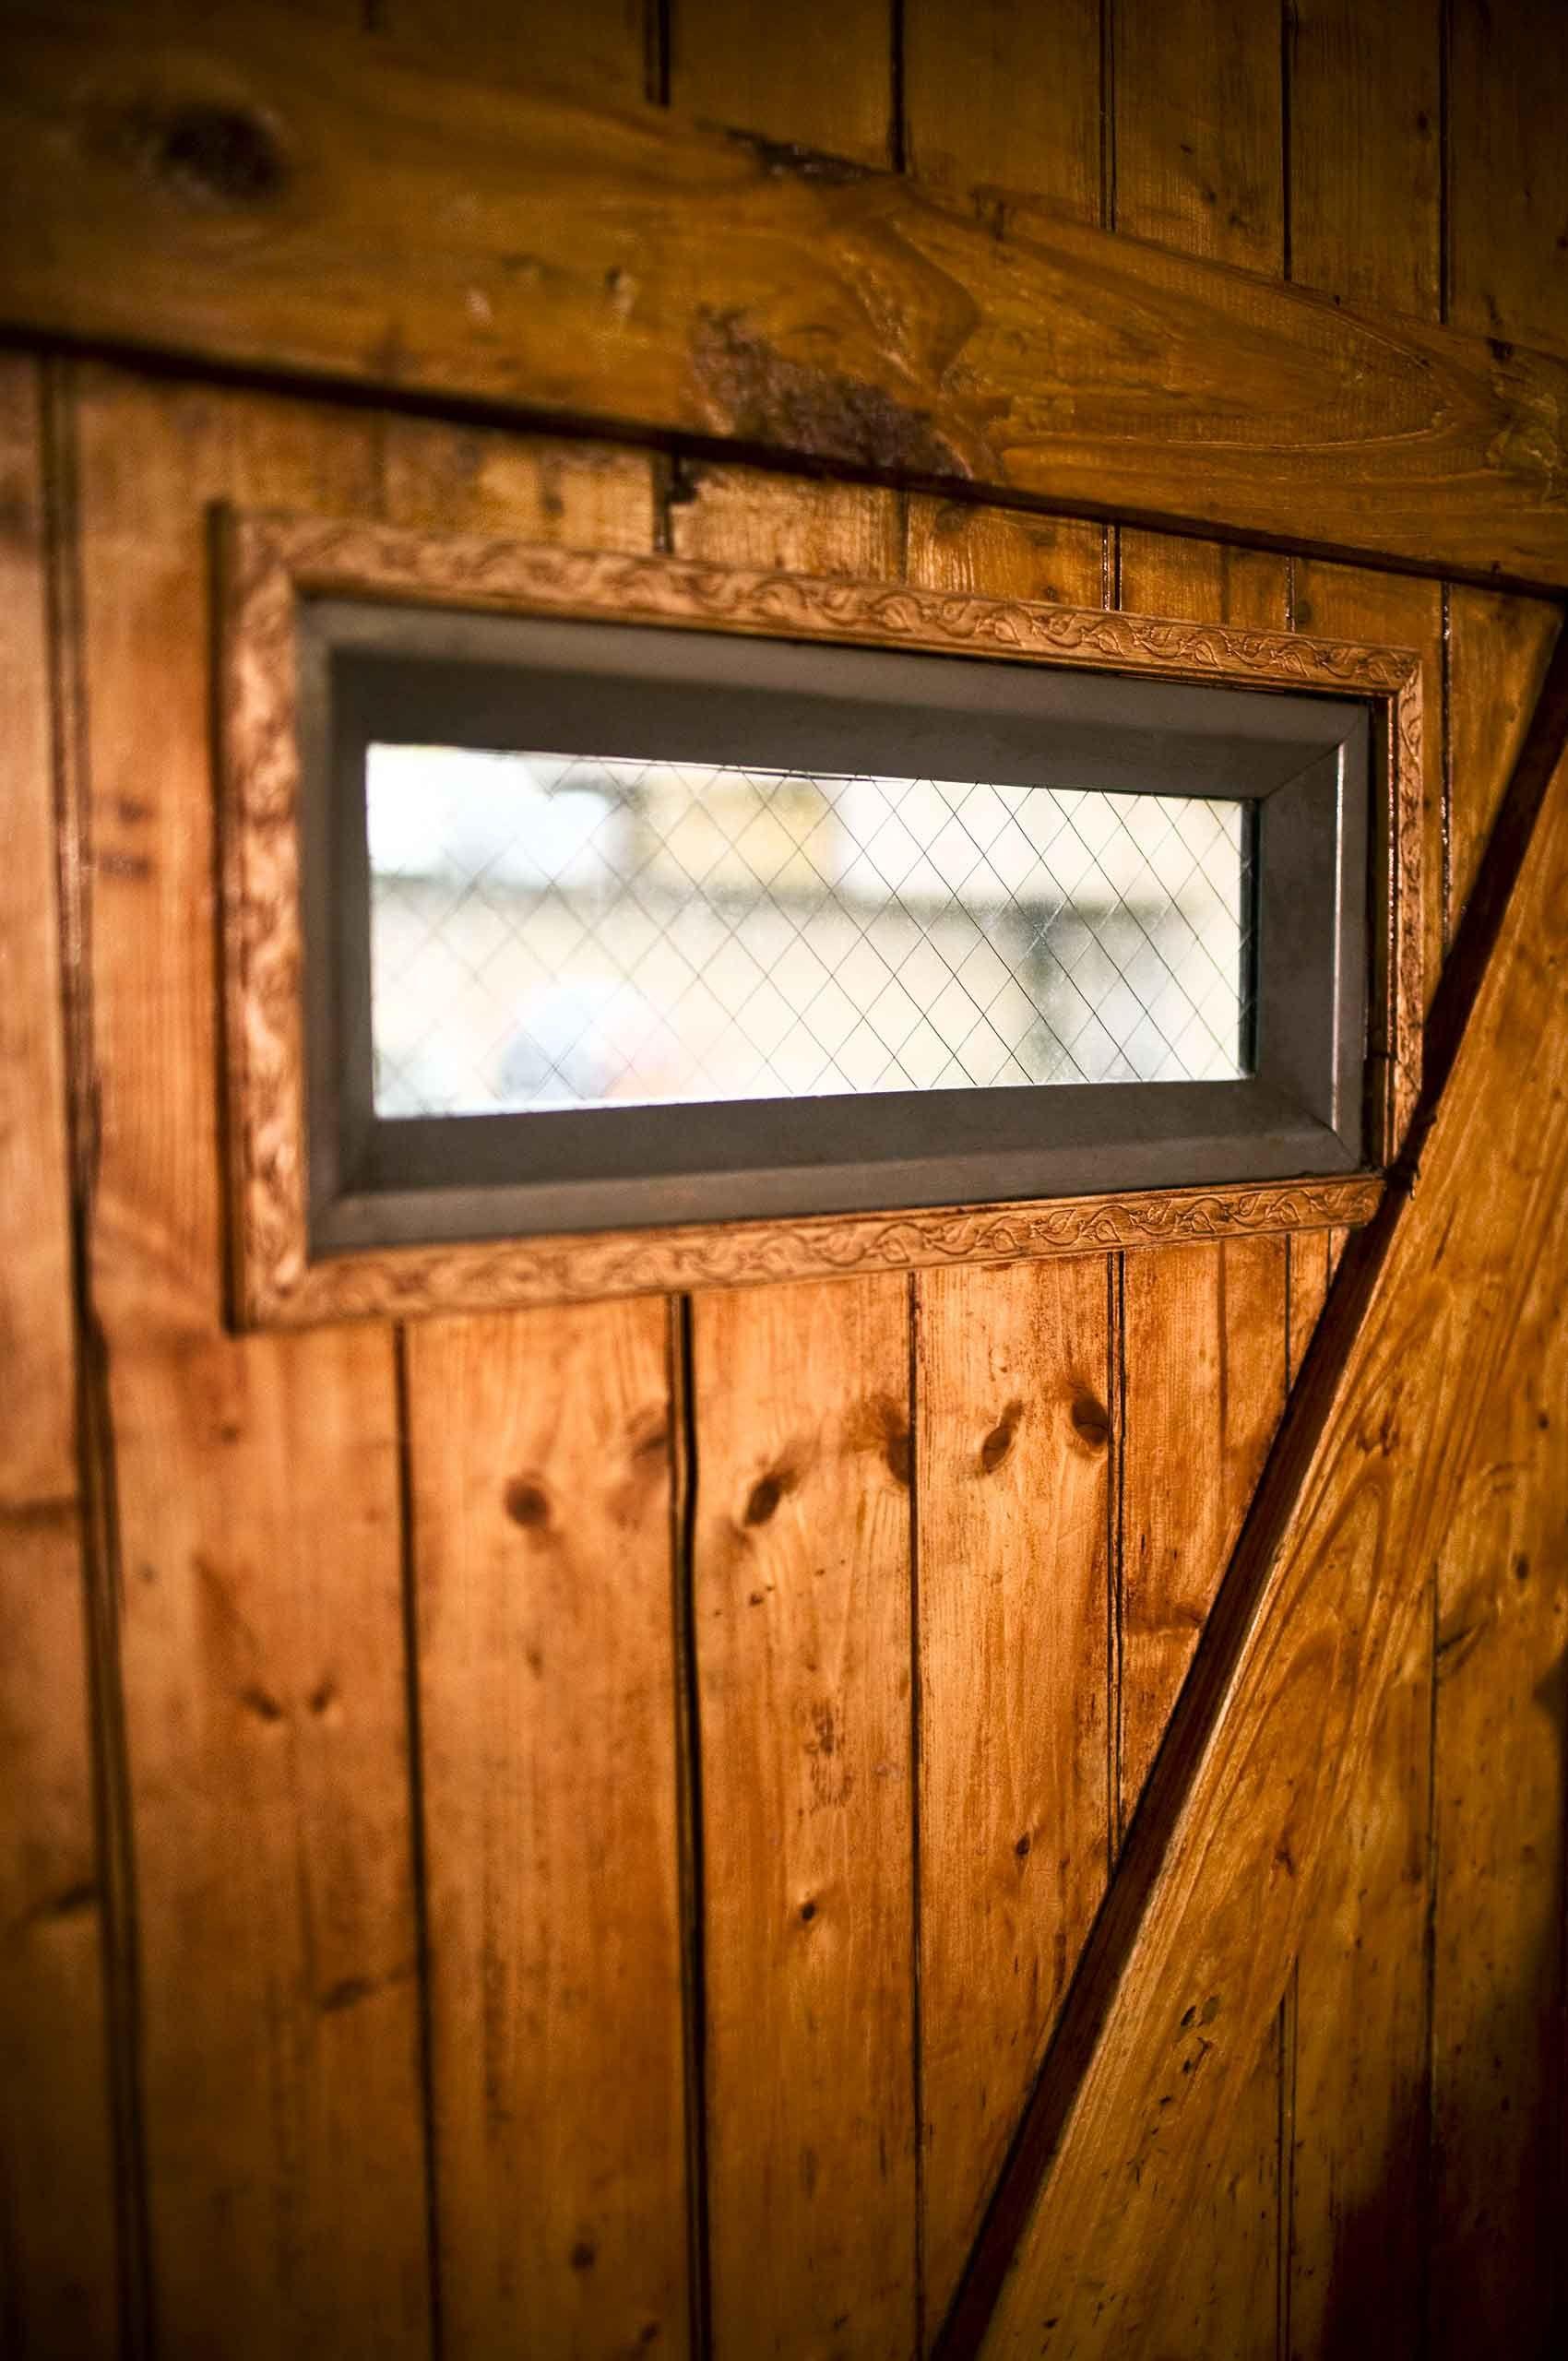 Kitchendoor-with-window-by-HenrikOlundPhotography..jpg